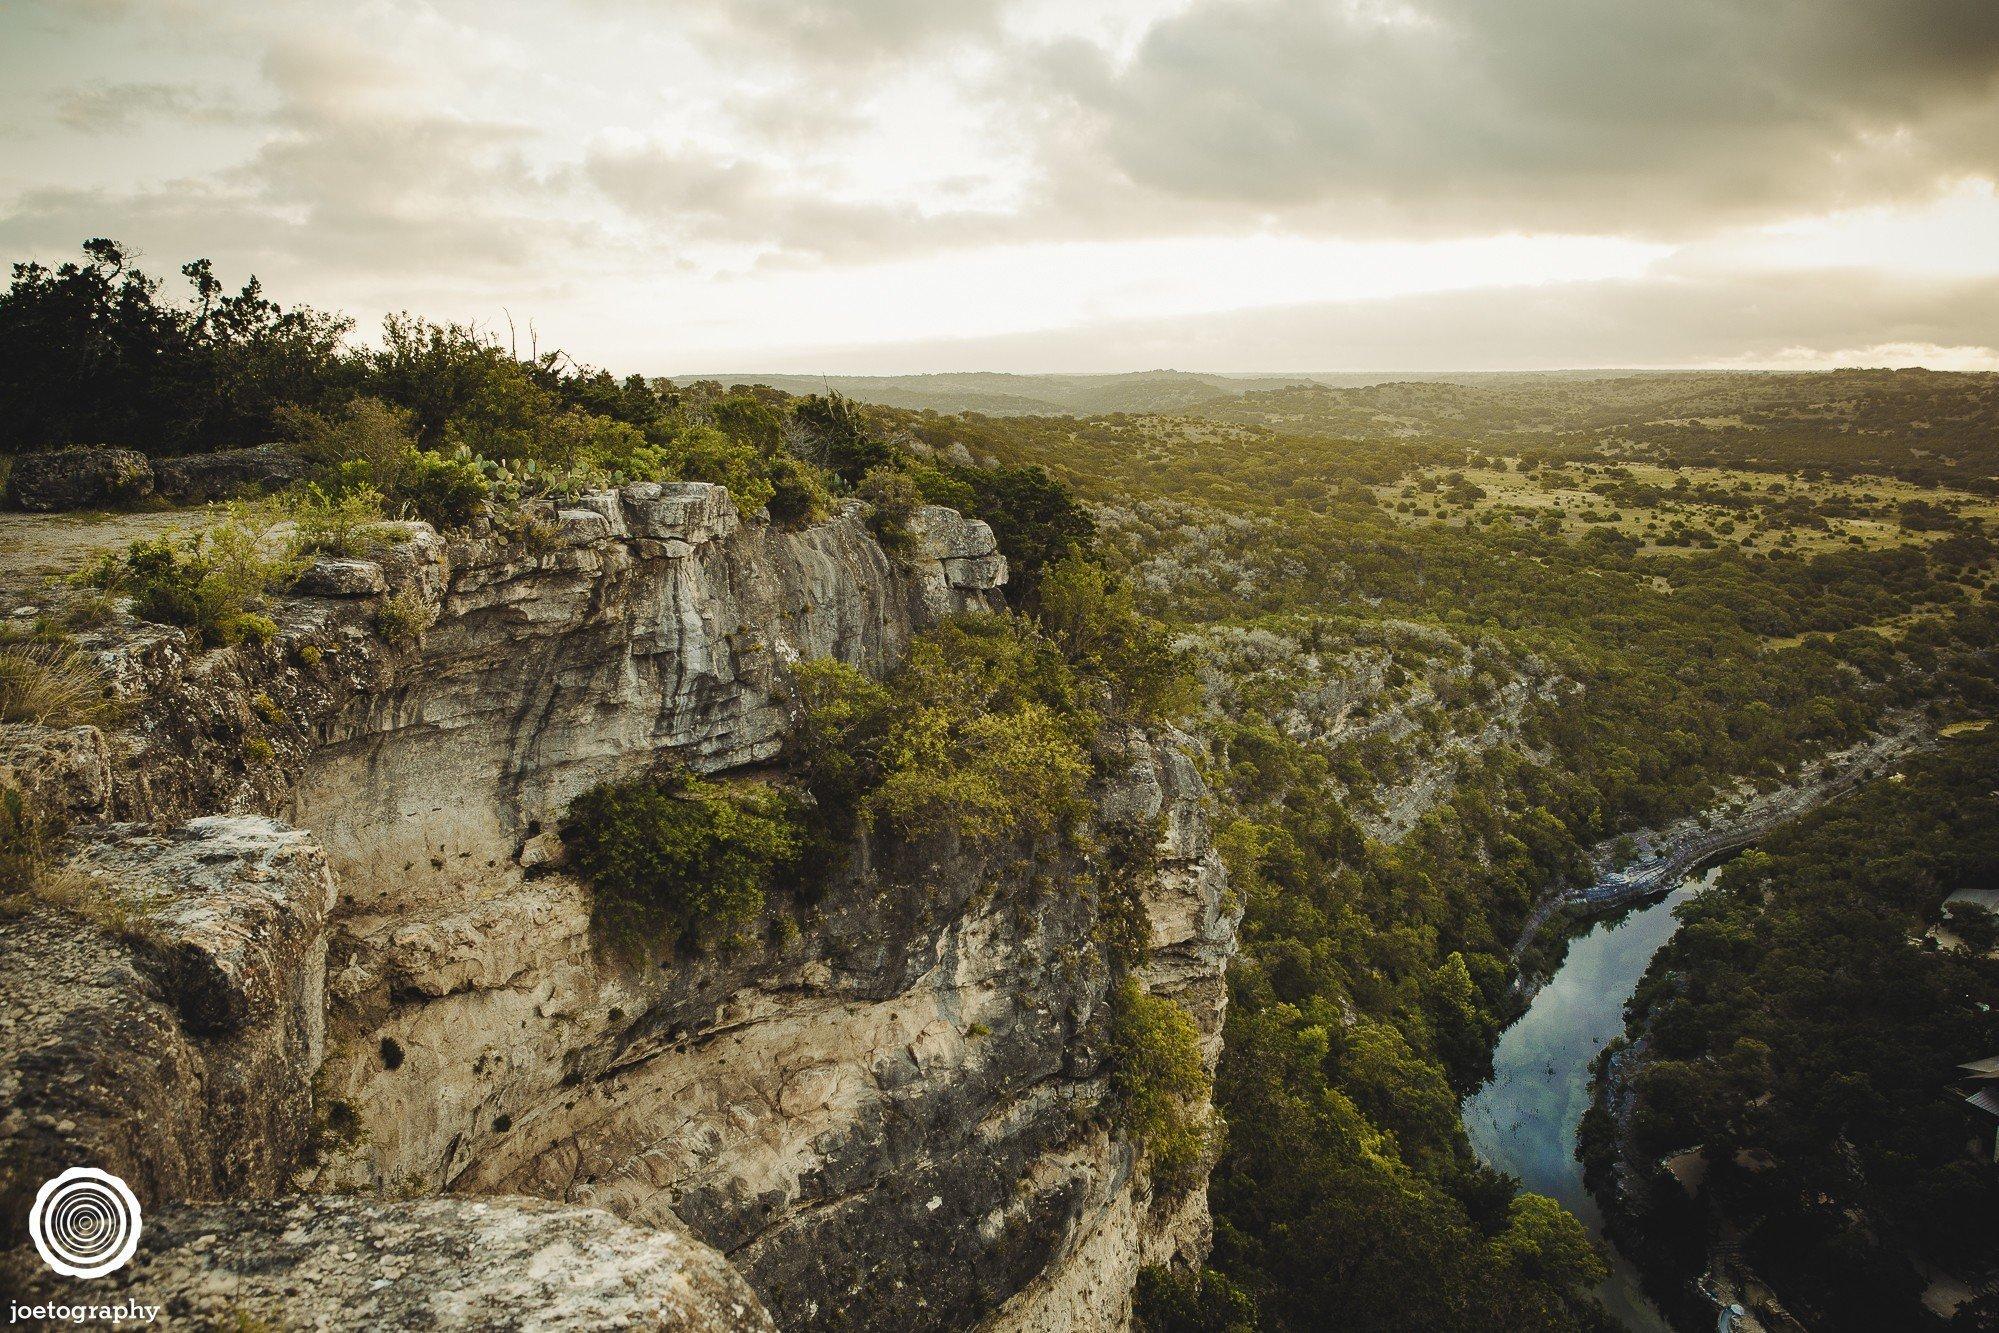 laity-lodge-san-antonio-texas-landscape-photographer-indianapolis-29